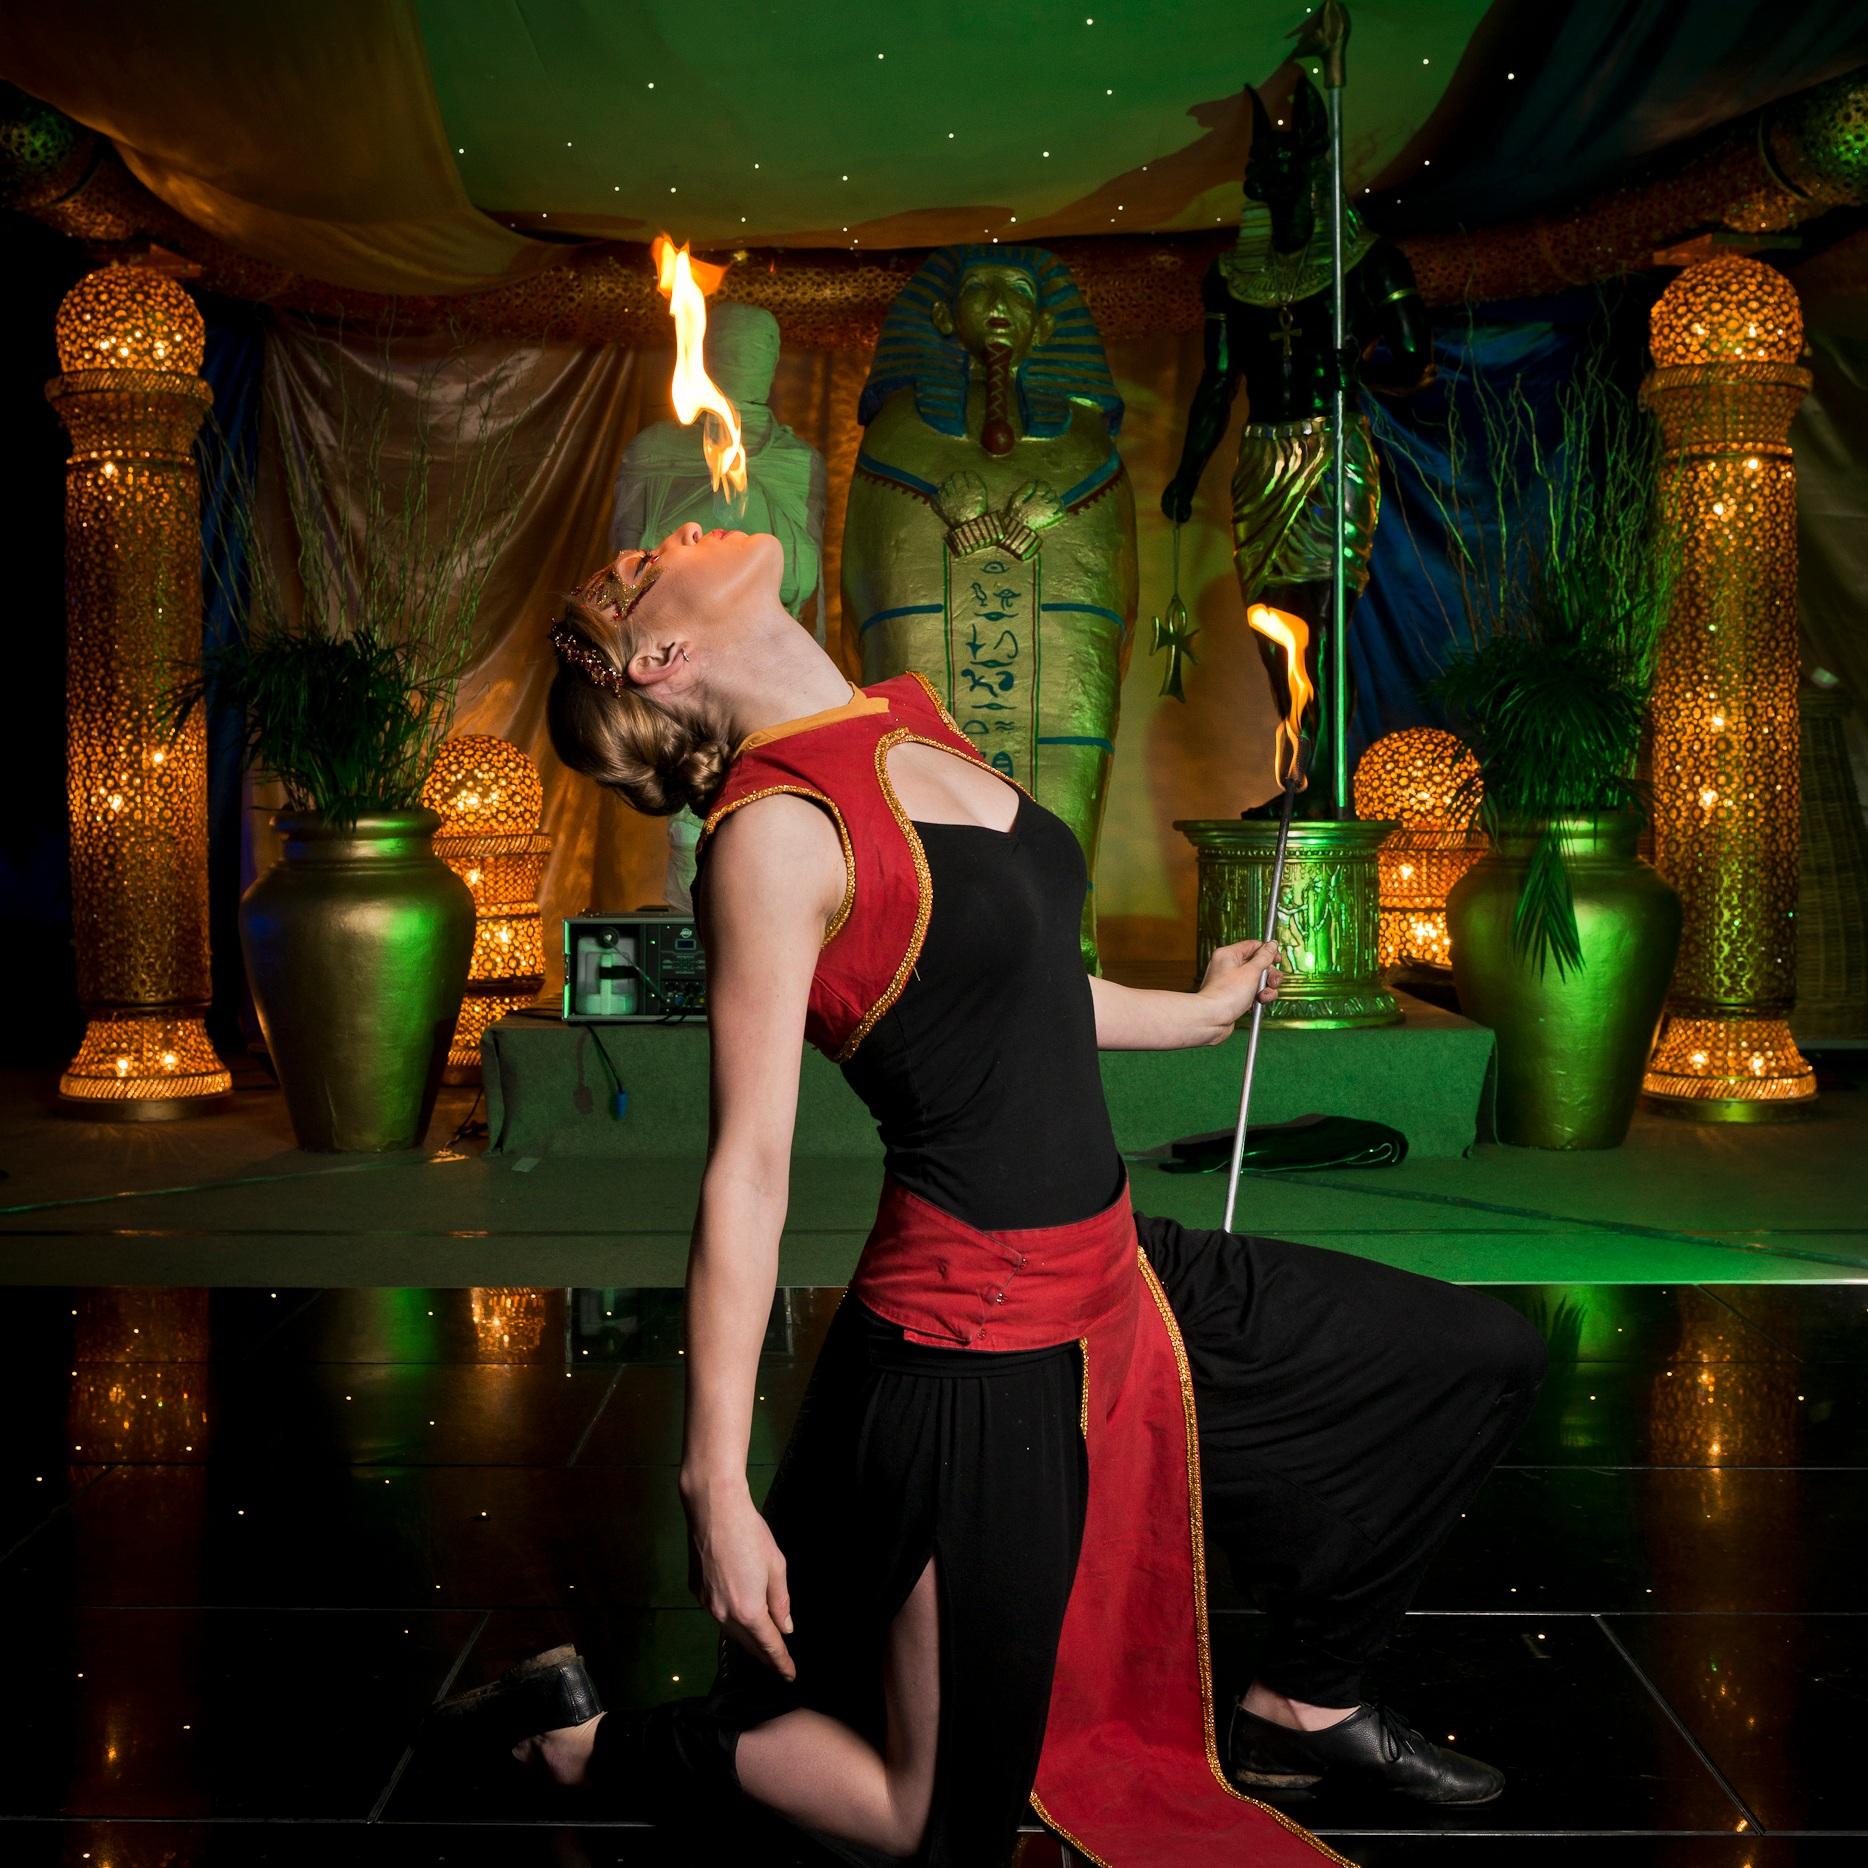 Arabian flames